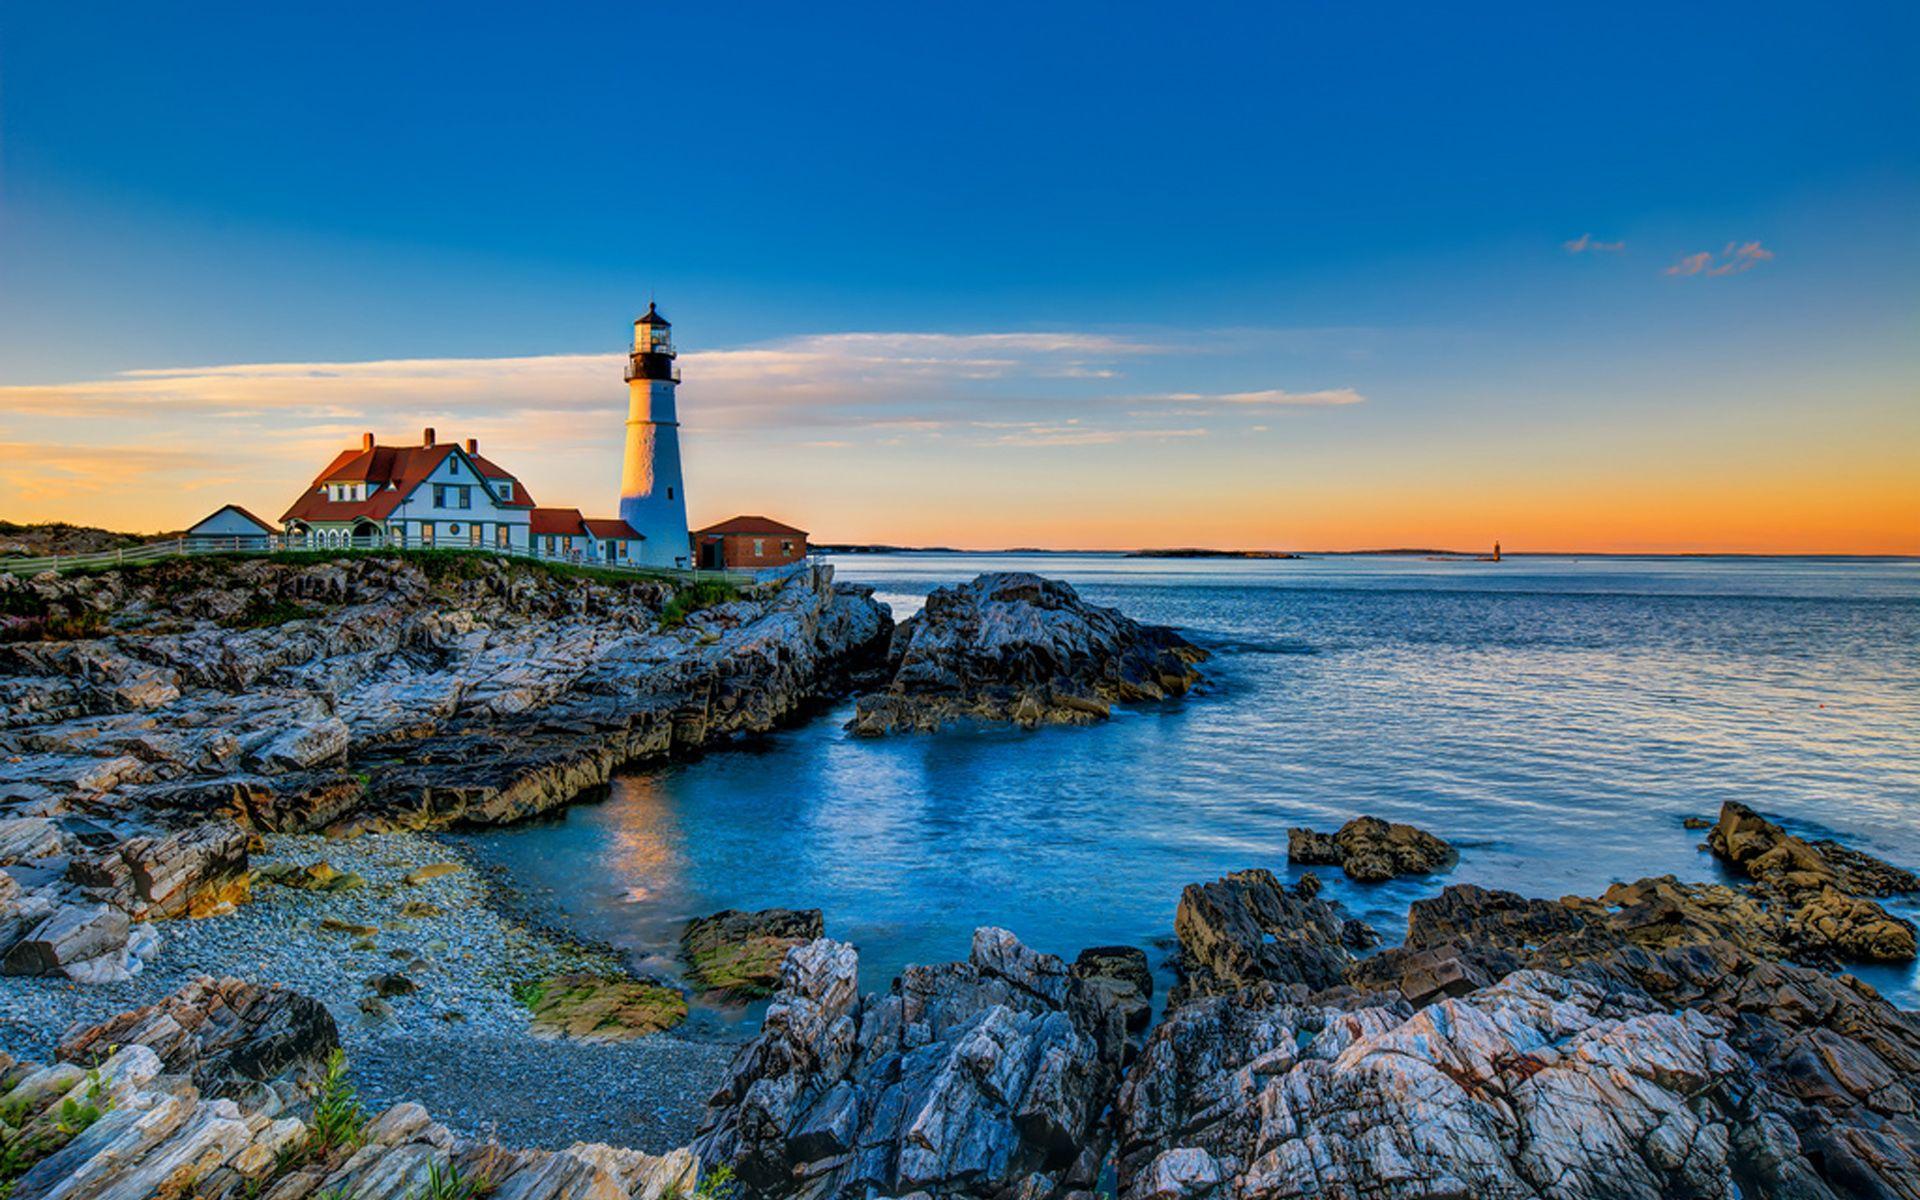 Sunset Landscape Hd Wallpaper Google Search Wonders Of The World Lighthouse Landscape